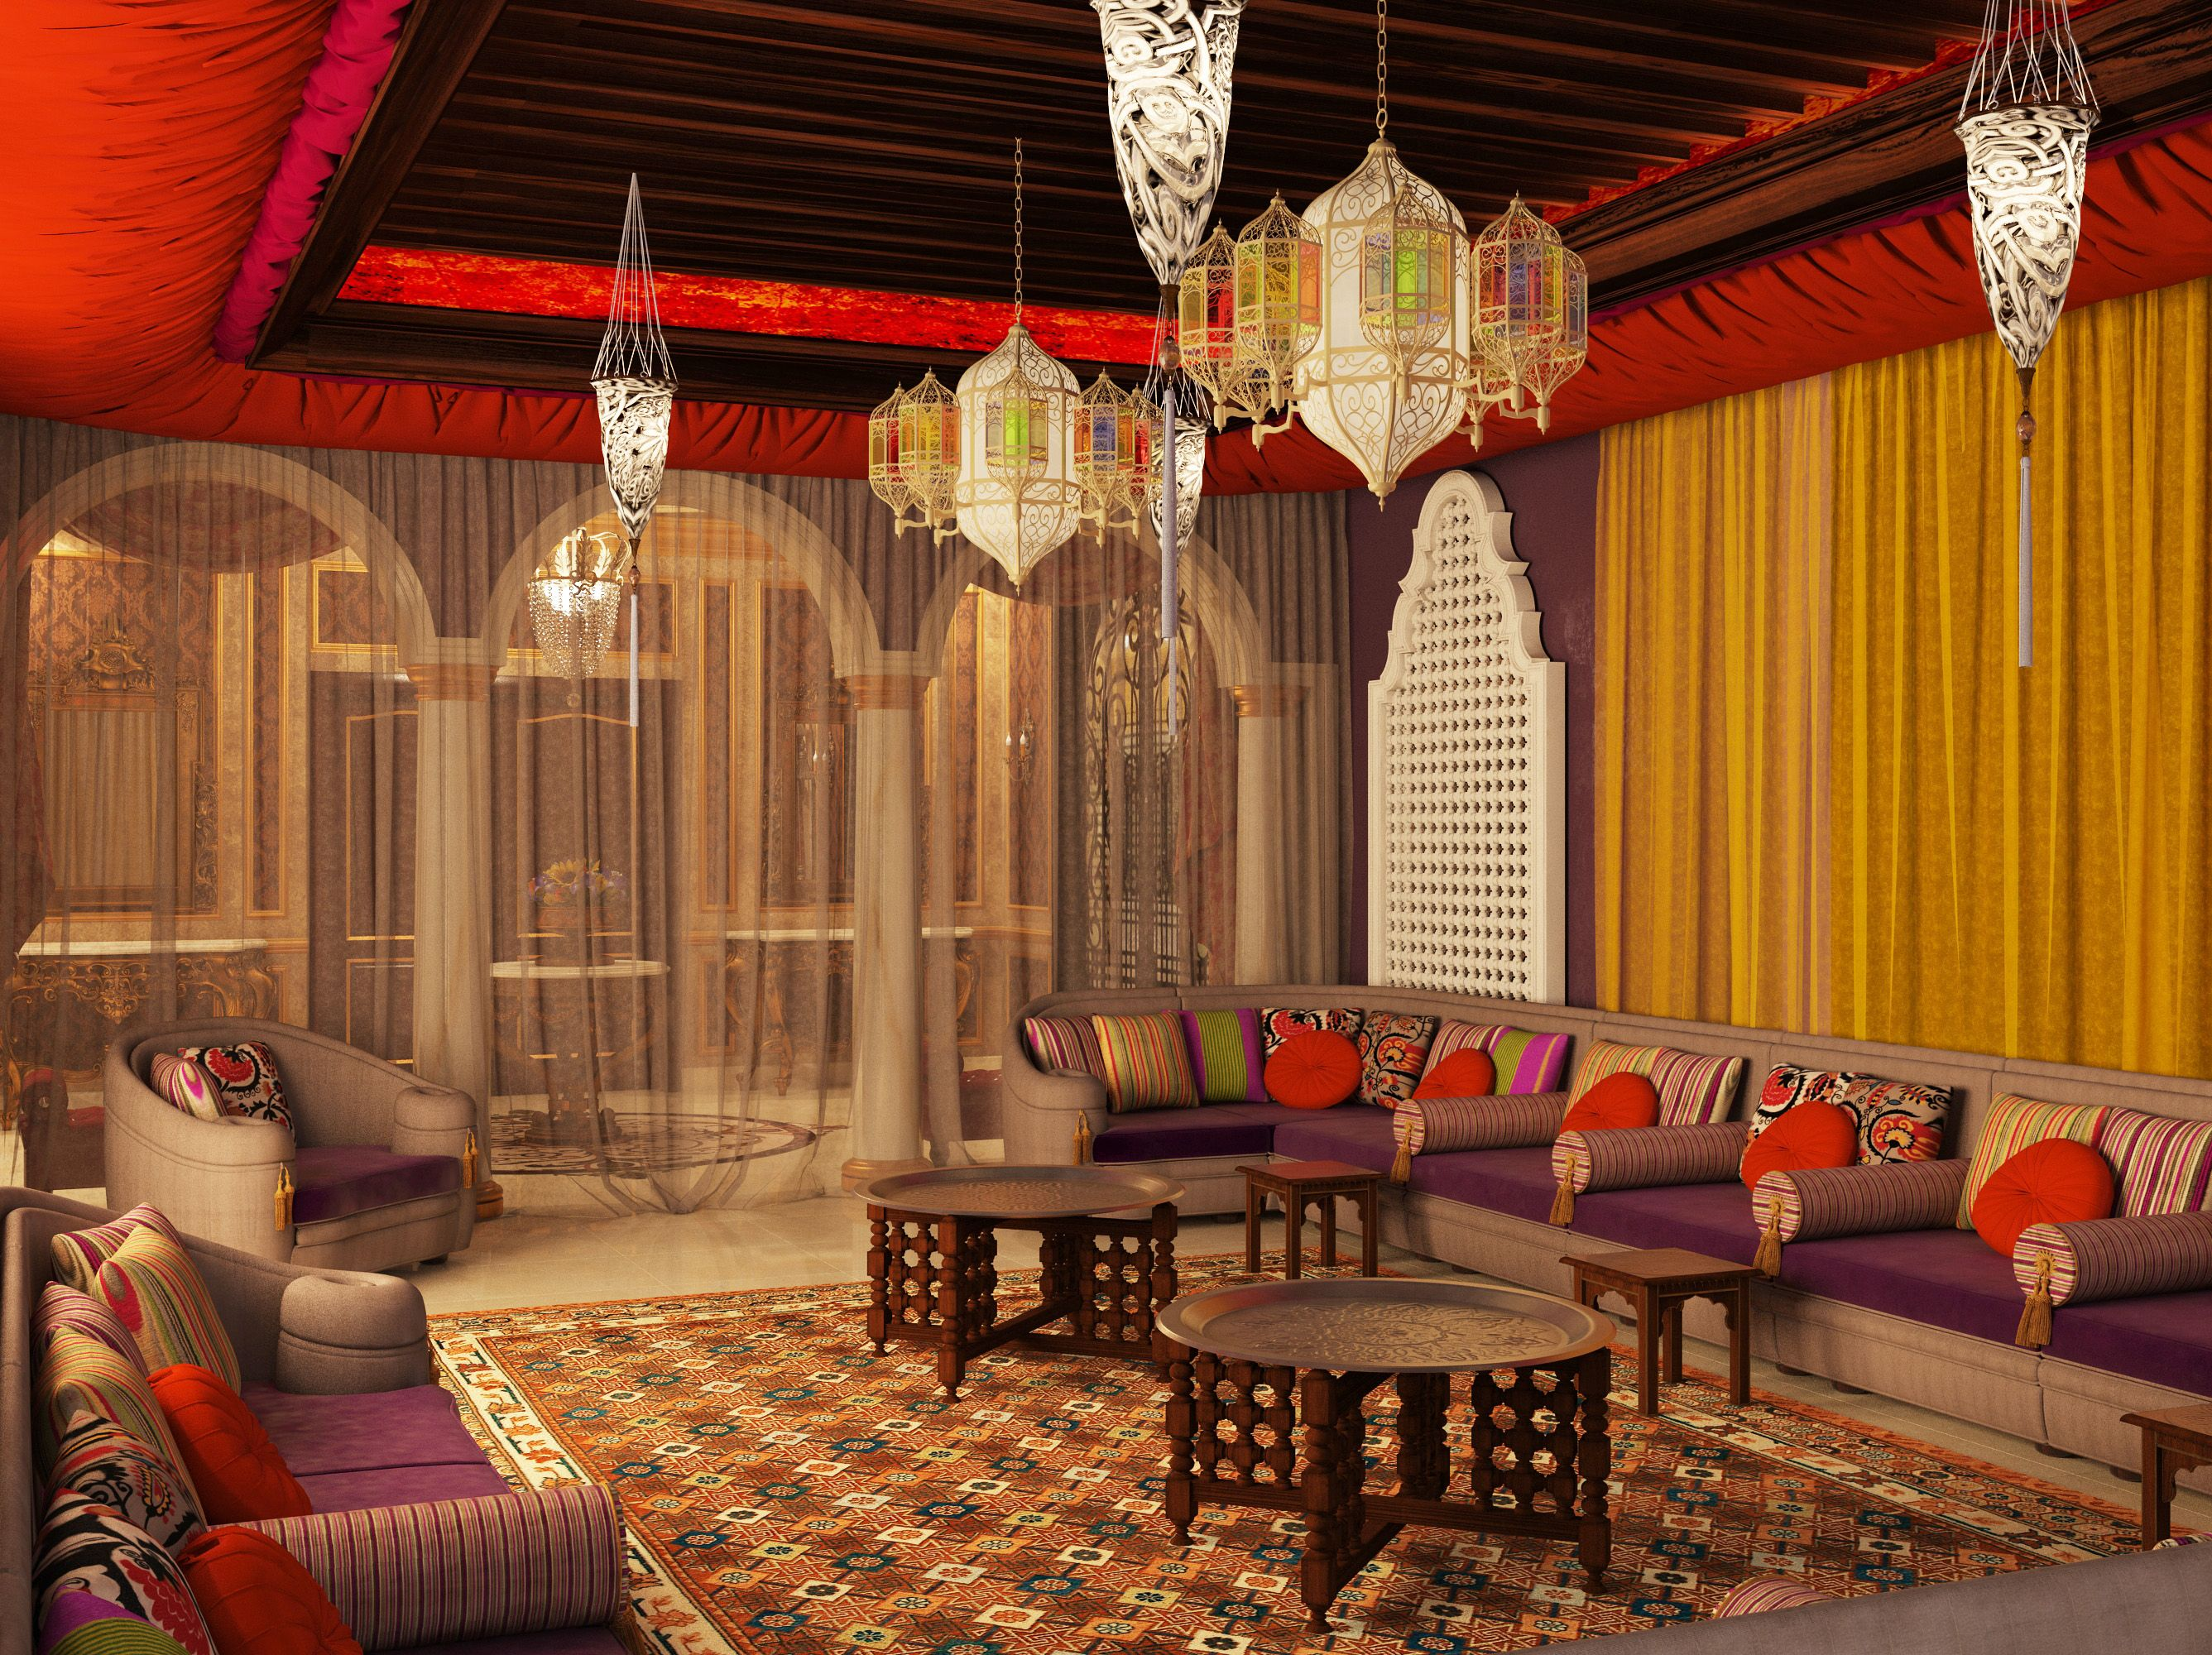 Majlis I Love This Arabic DesignMoroccan